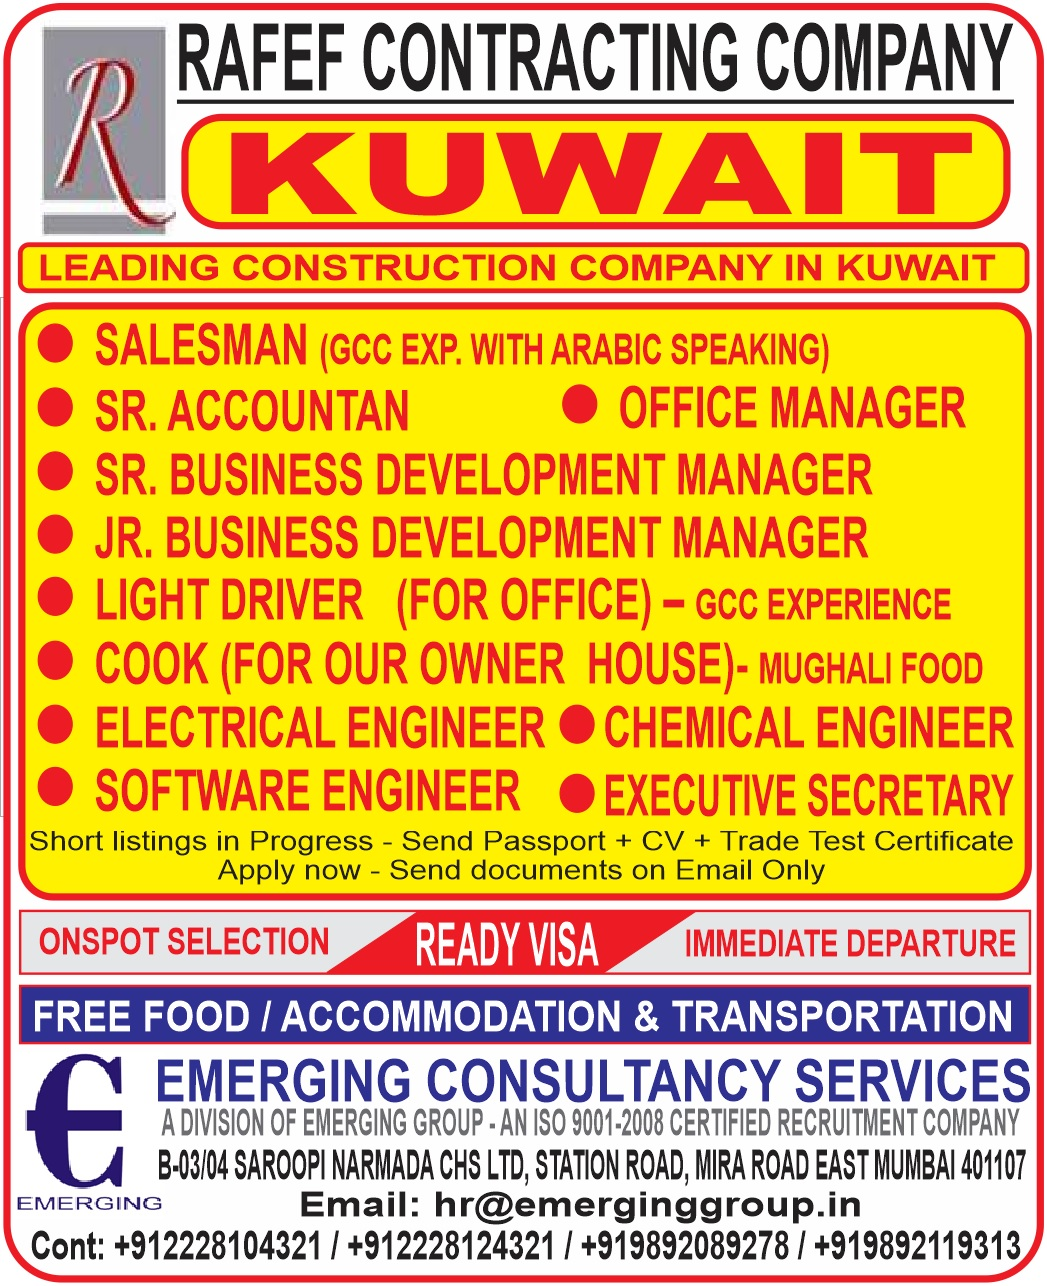 Leading Construction Company - Rafef Contracting Company